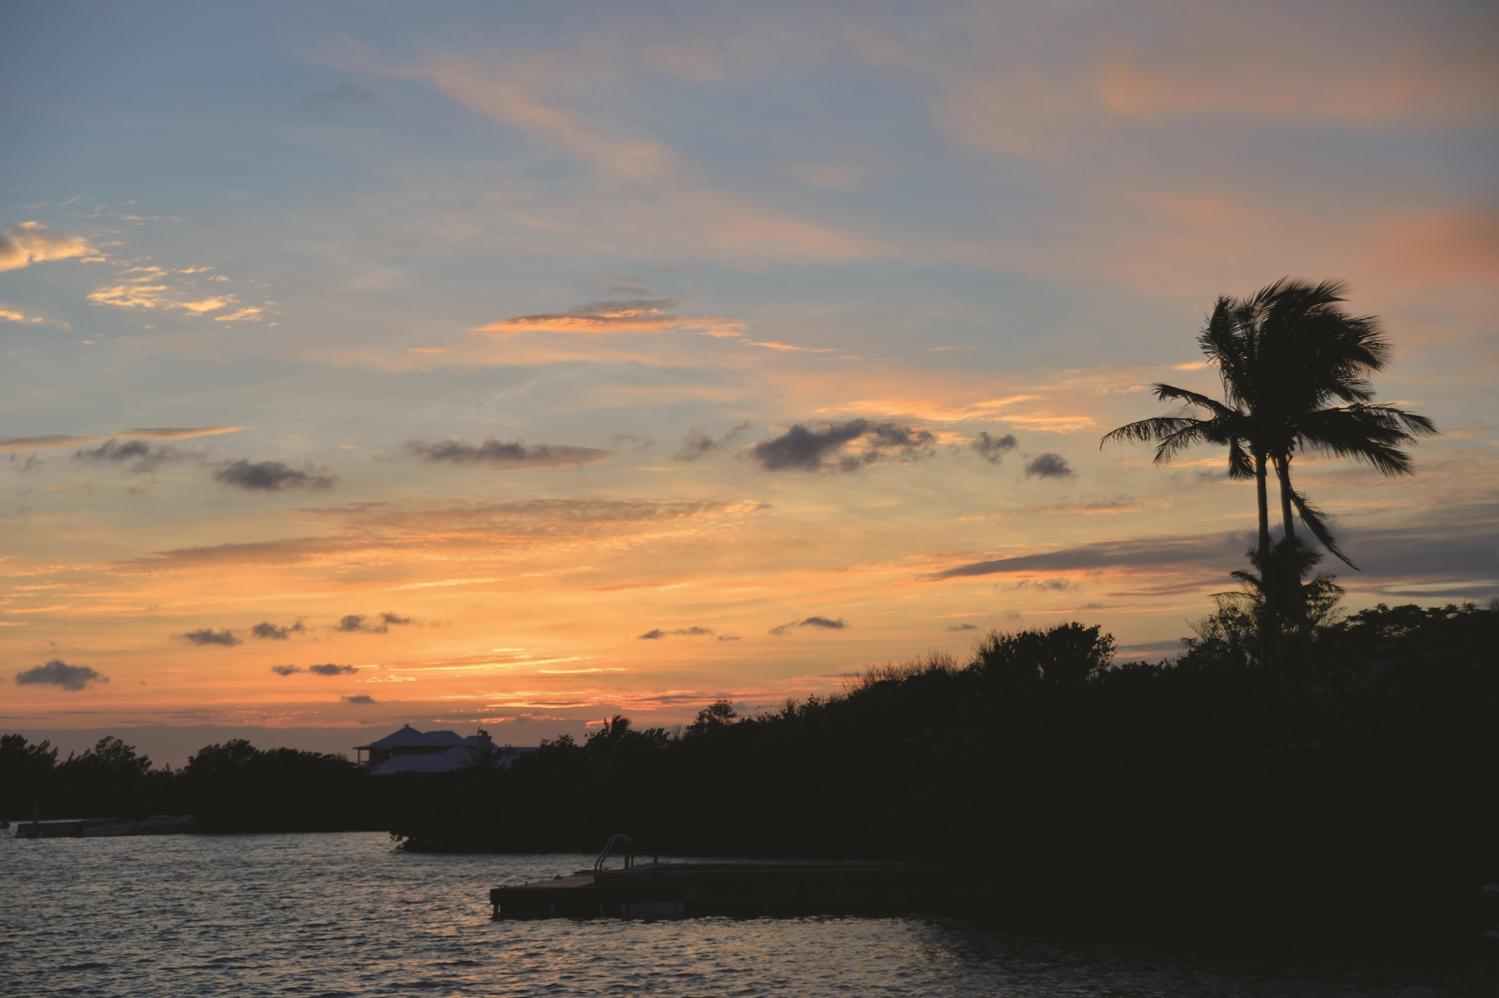 Waterlot View at Sunset